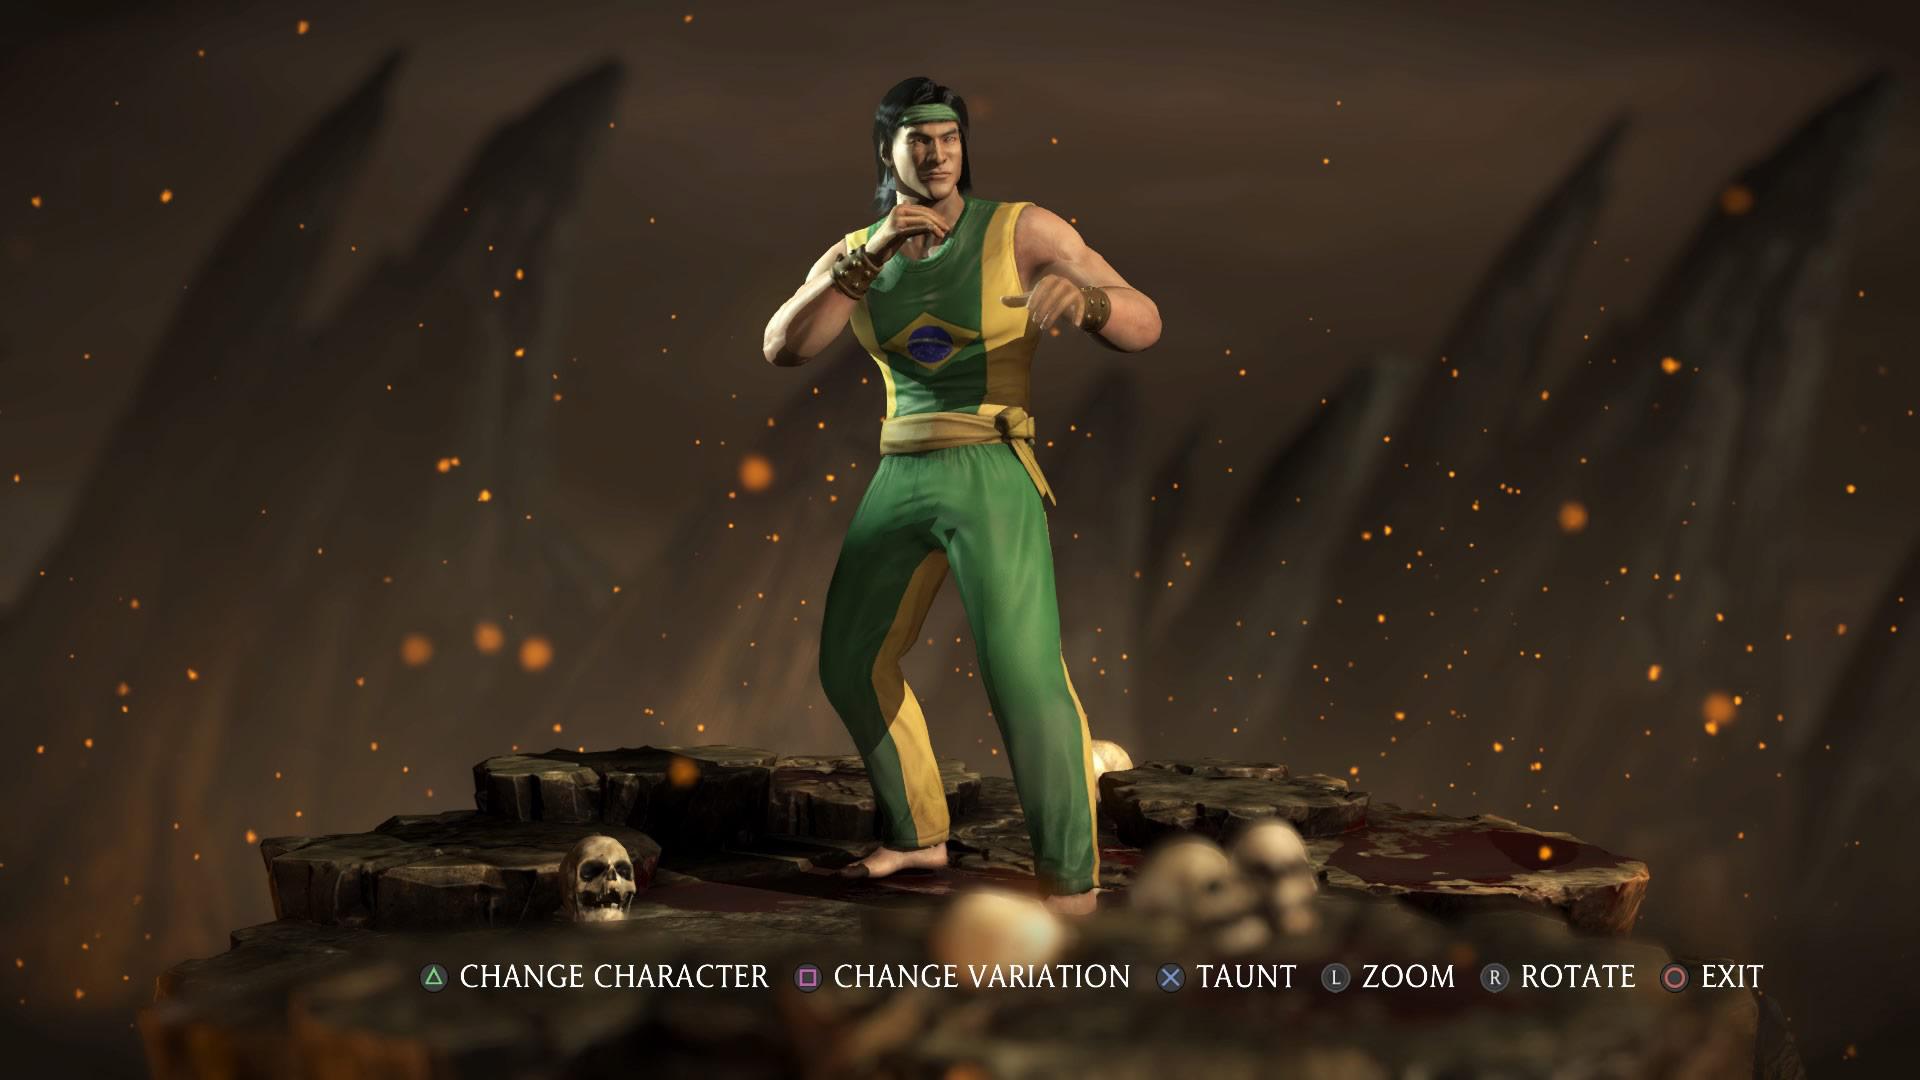 Mortal Kombat XL Kombat Pack 2  12 out of 14 image gallery